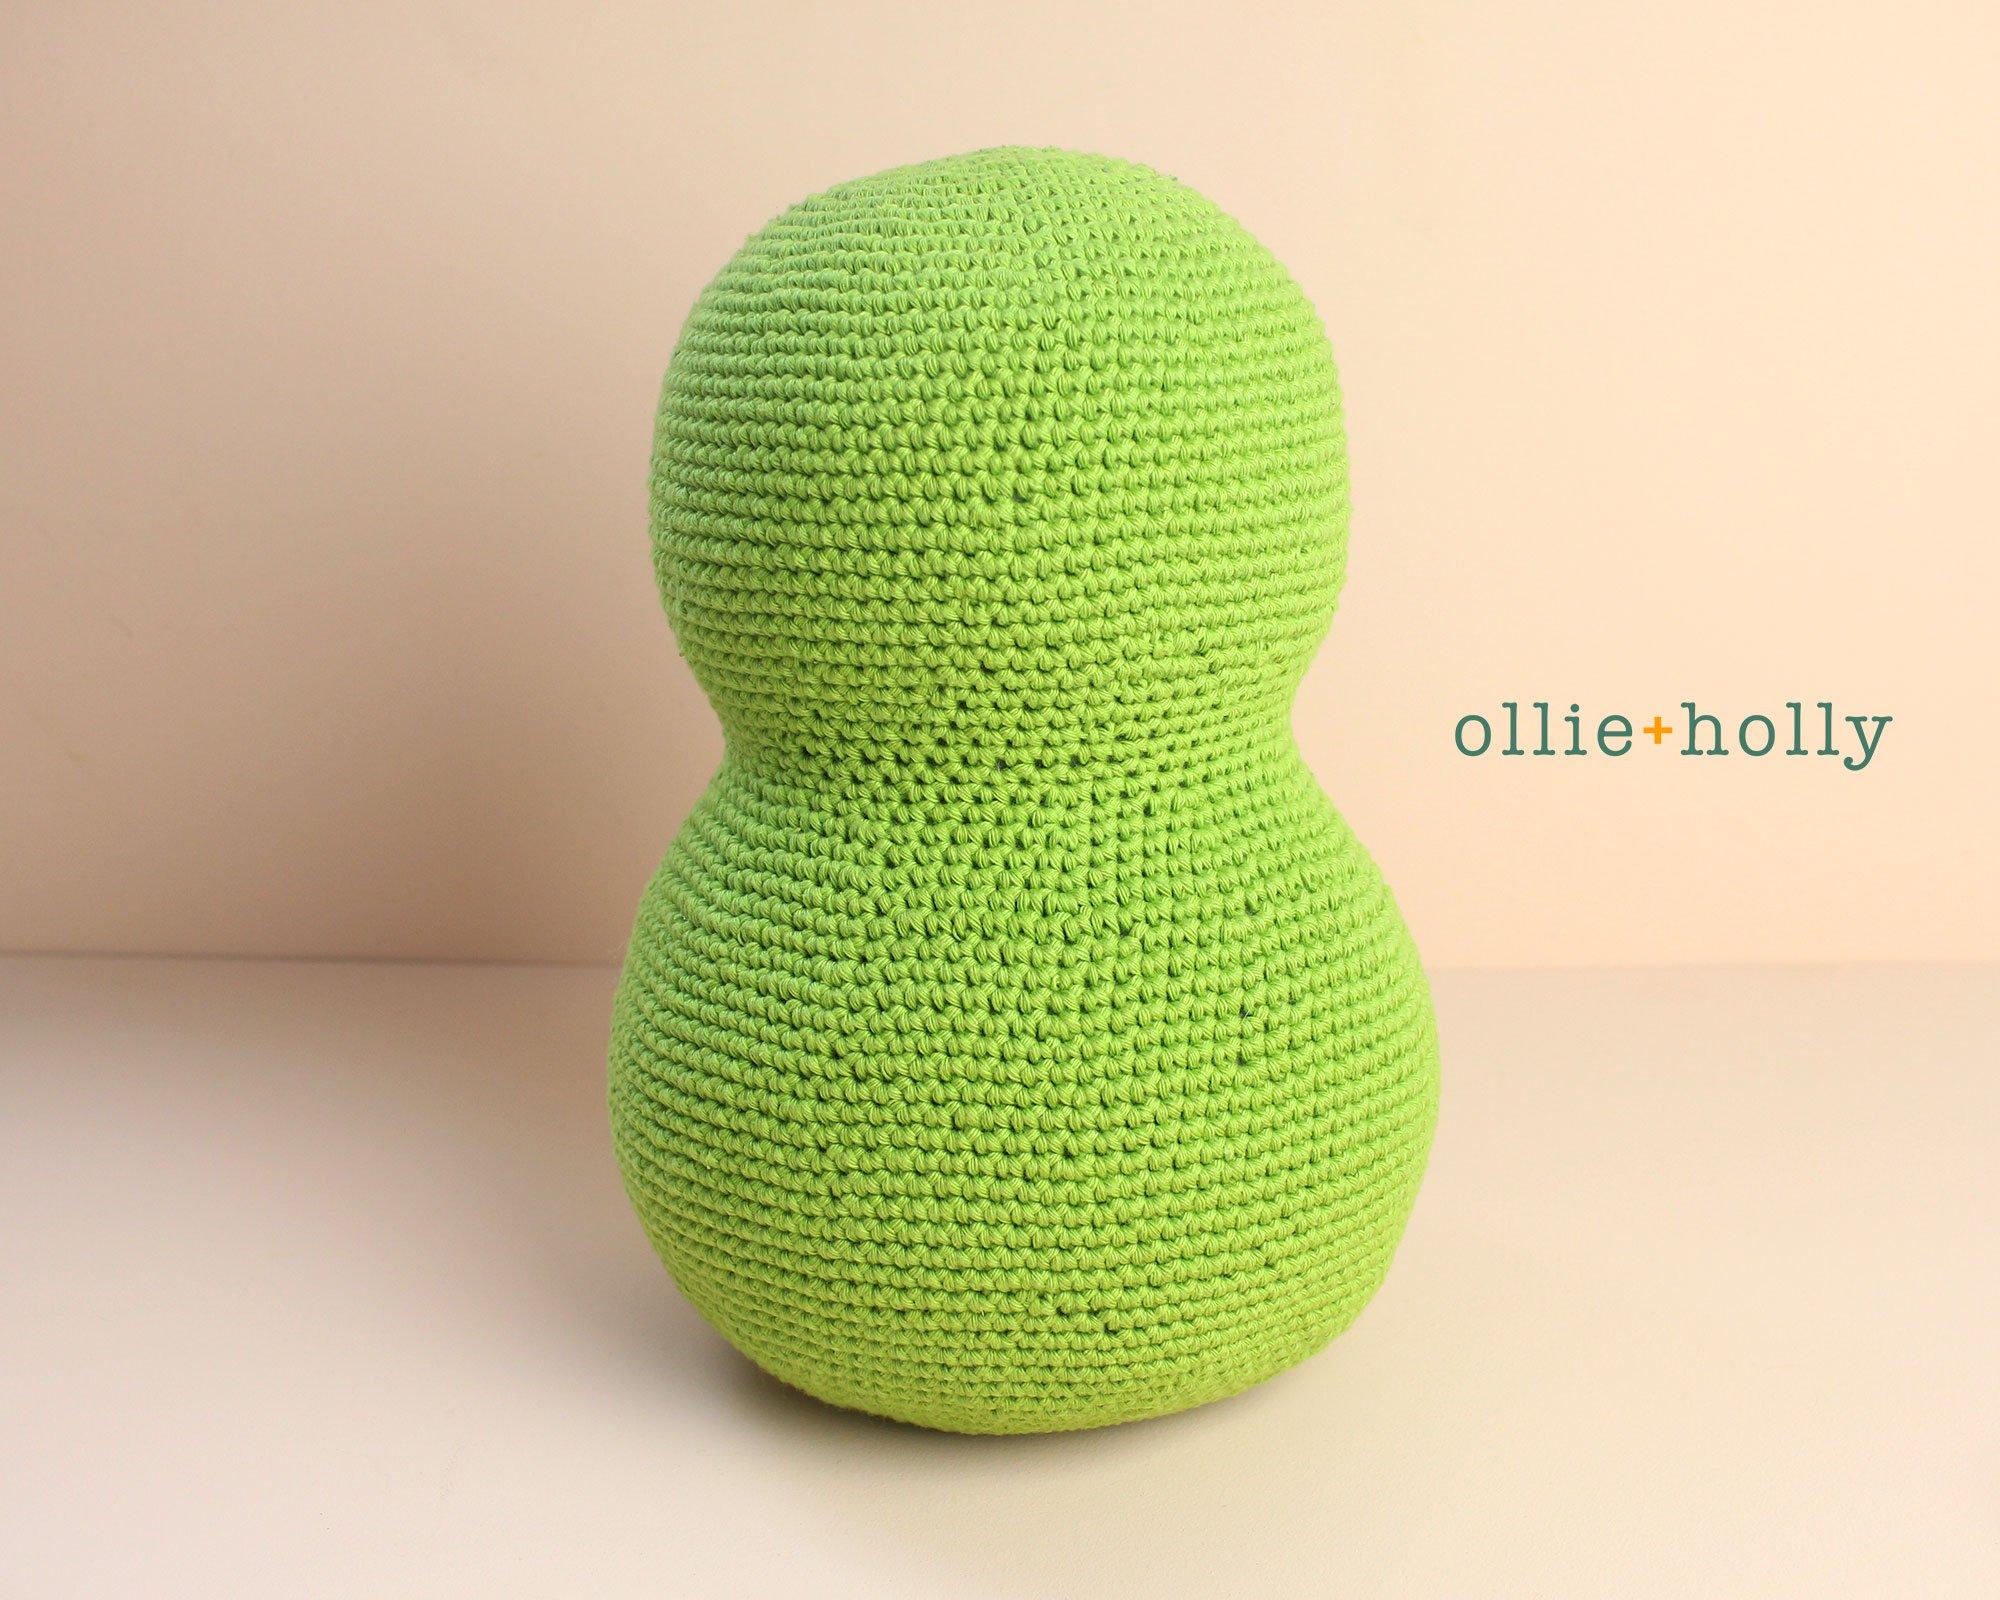 Free Louise Belcher's Stuffed Animal Kuchi Kopi (from Bob's Burgers) Amigurumi Crochet Pattern Step 1